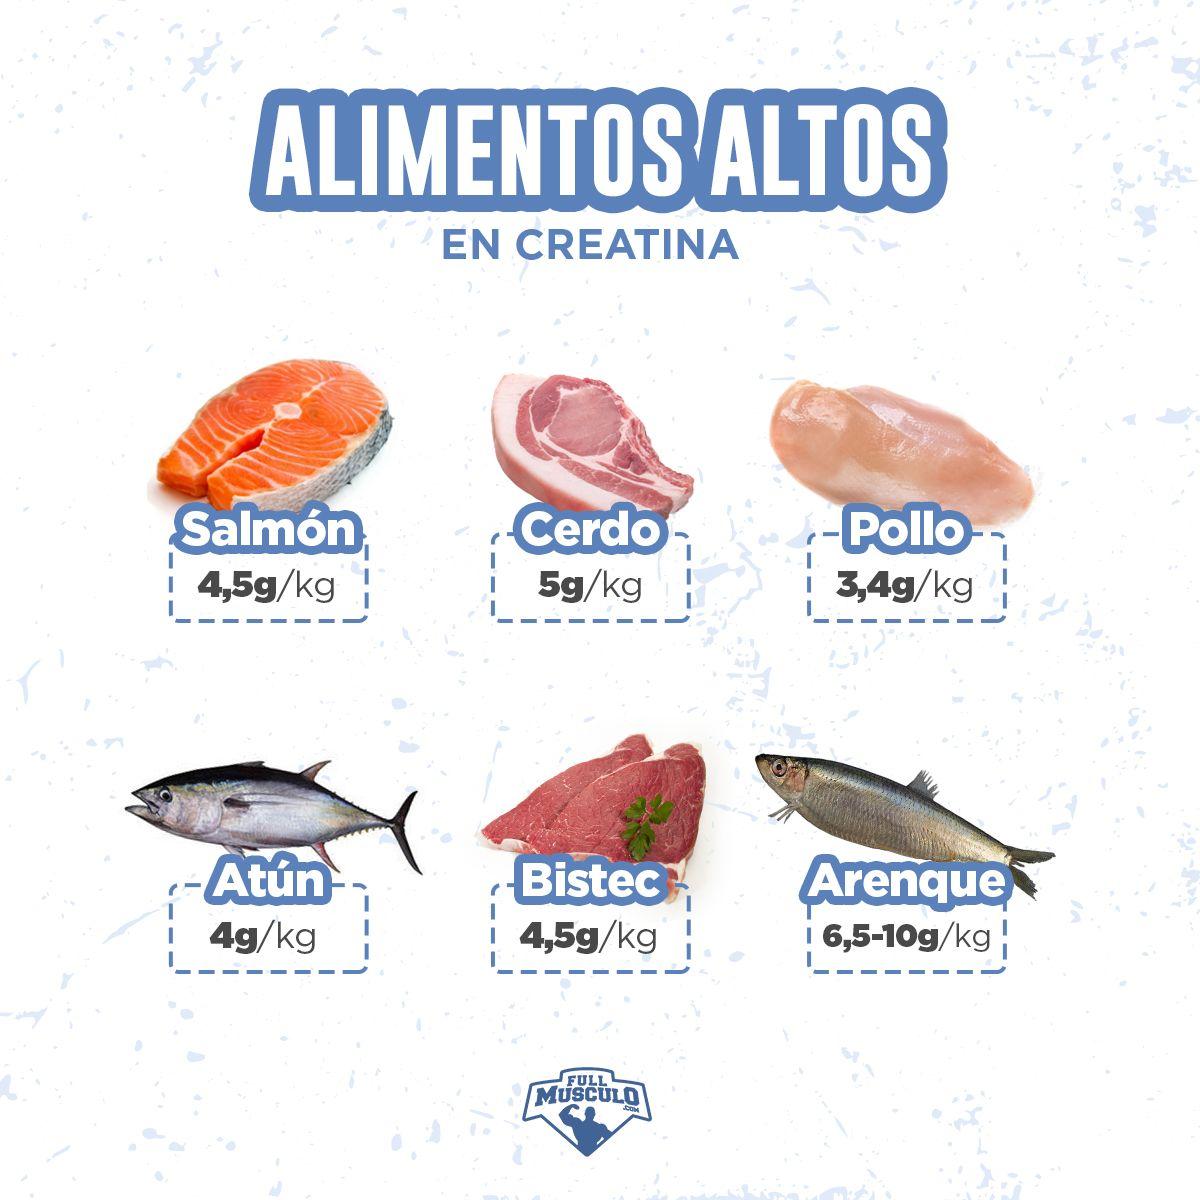 alimentos que contienen mas creatina